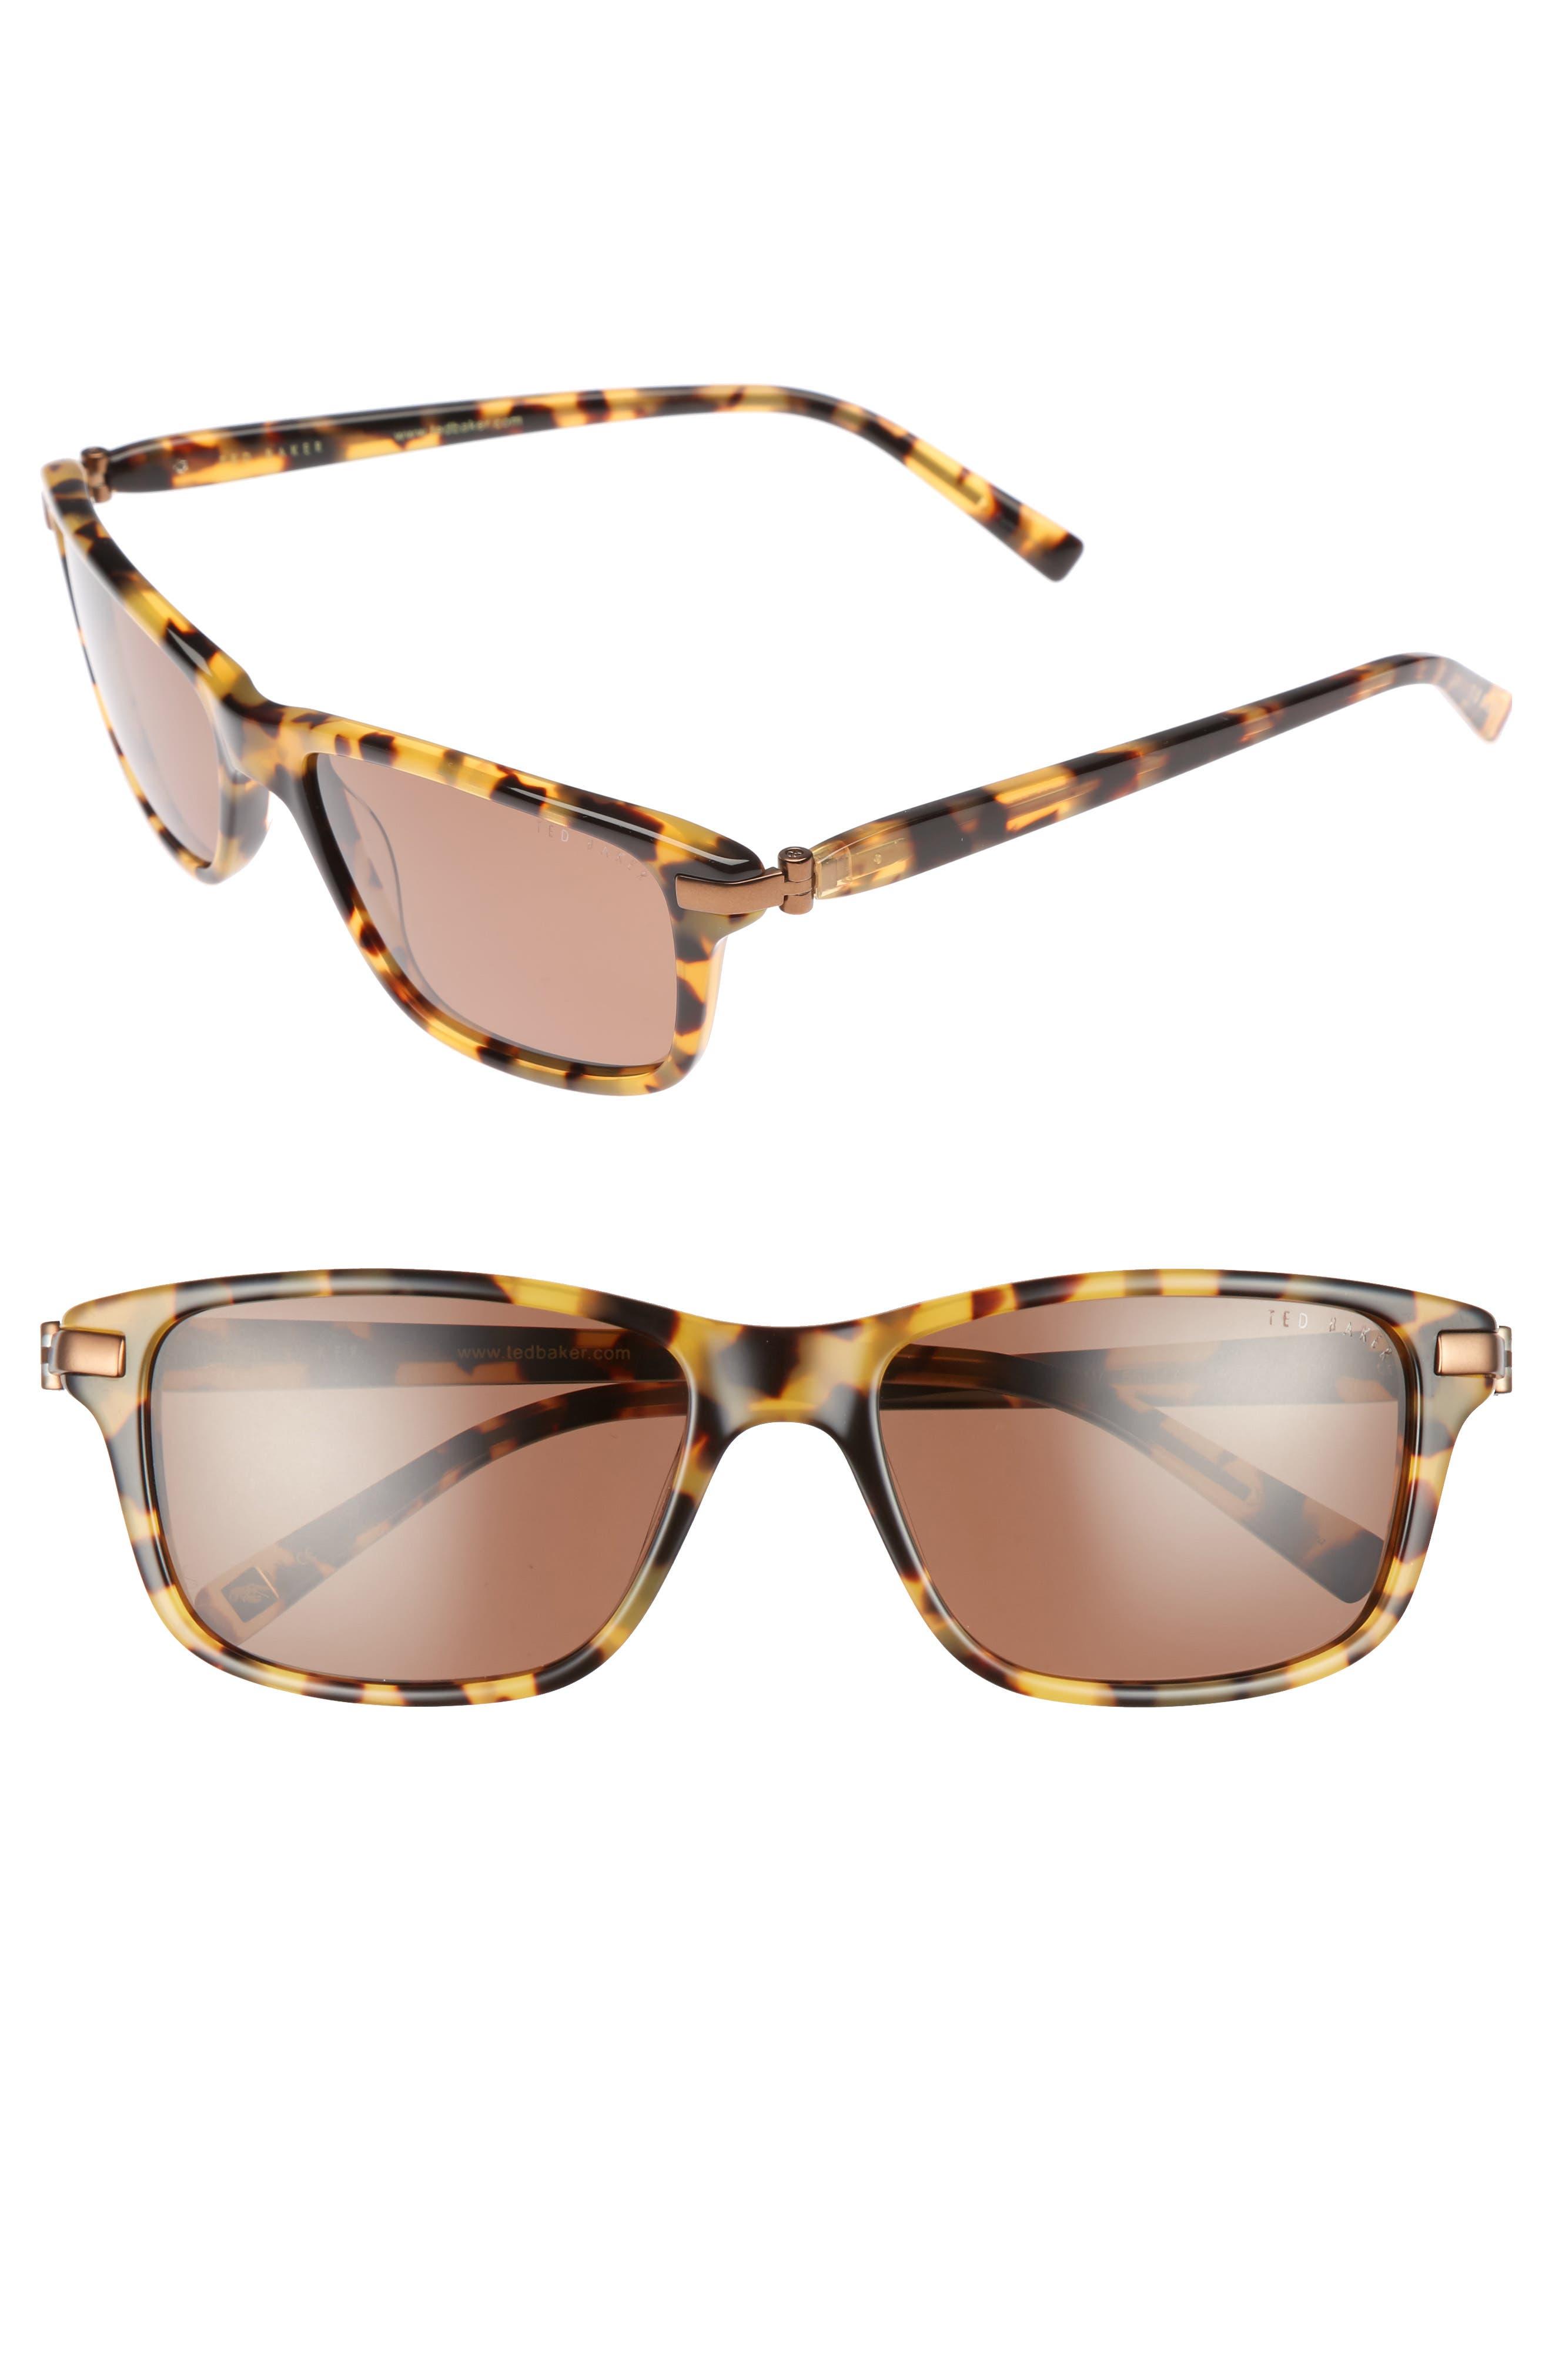 Alternate Image 1 Selected - Ted Baker London 55mm Polarized Sunglasses